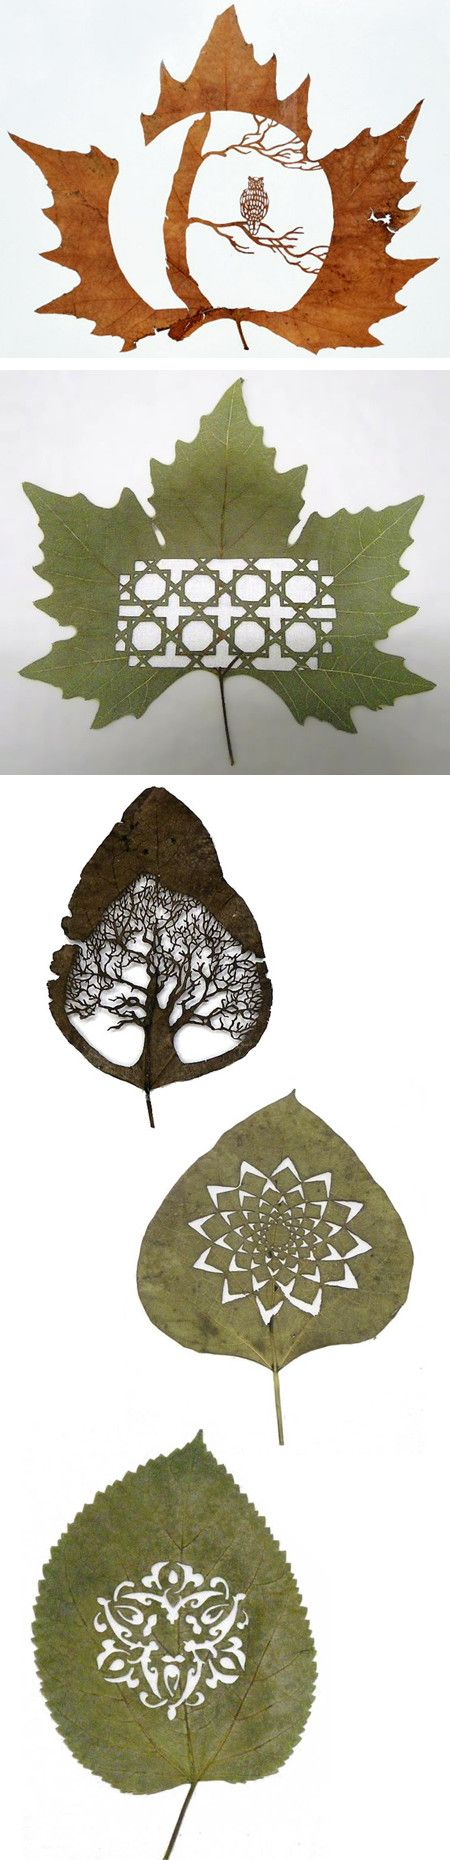 Leaves Art. Beautiful!